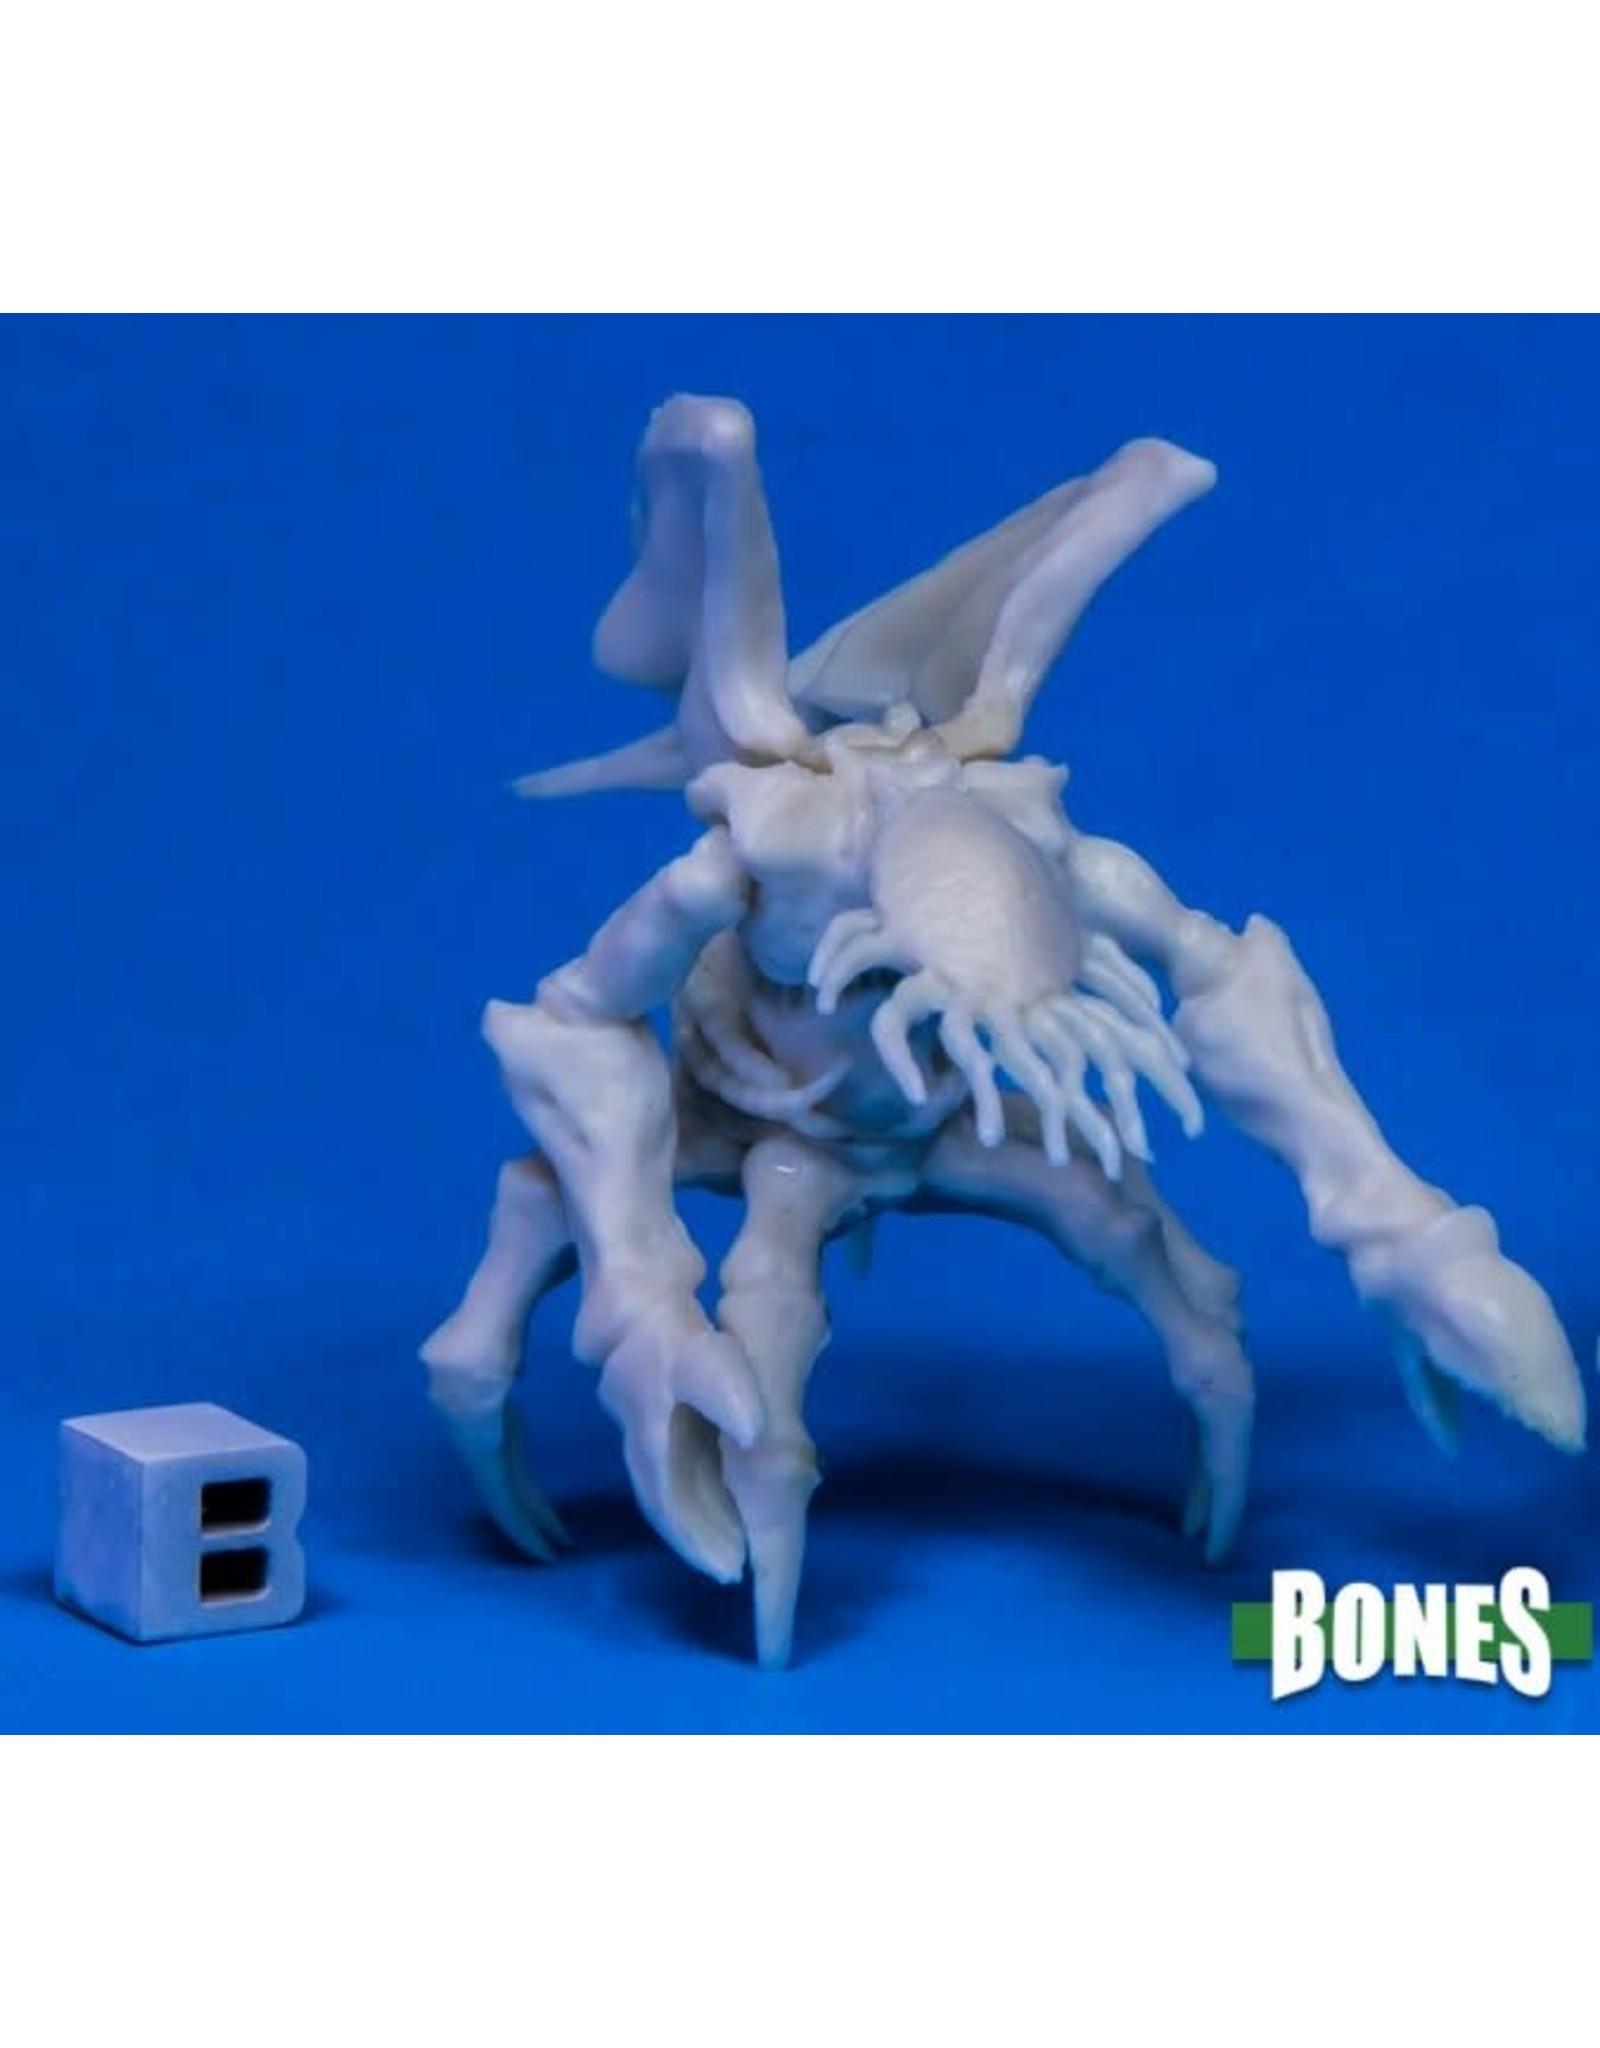 Reaper Miniatures Bones Mi-go, Eldritch Horror